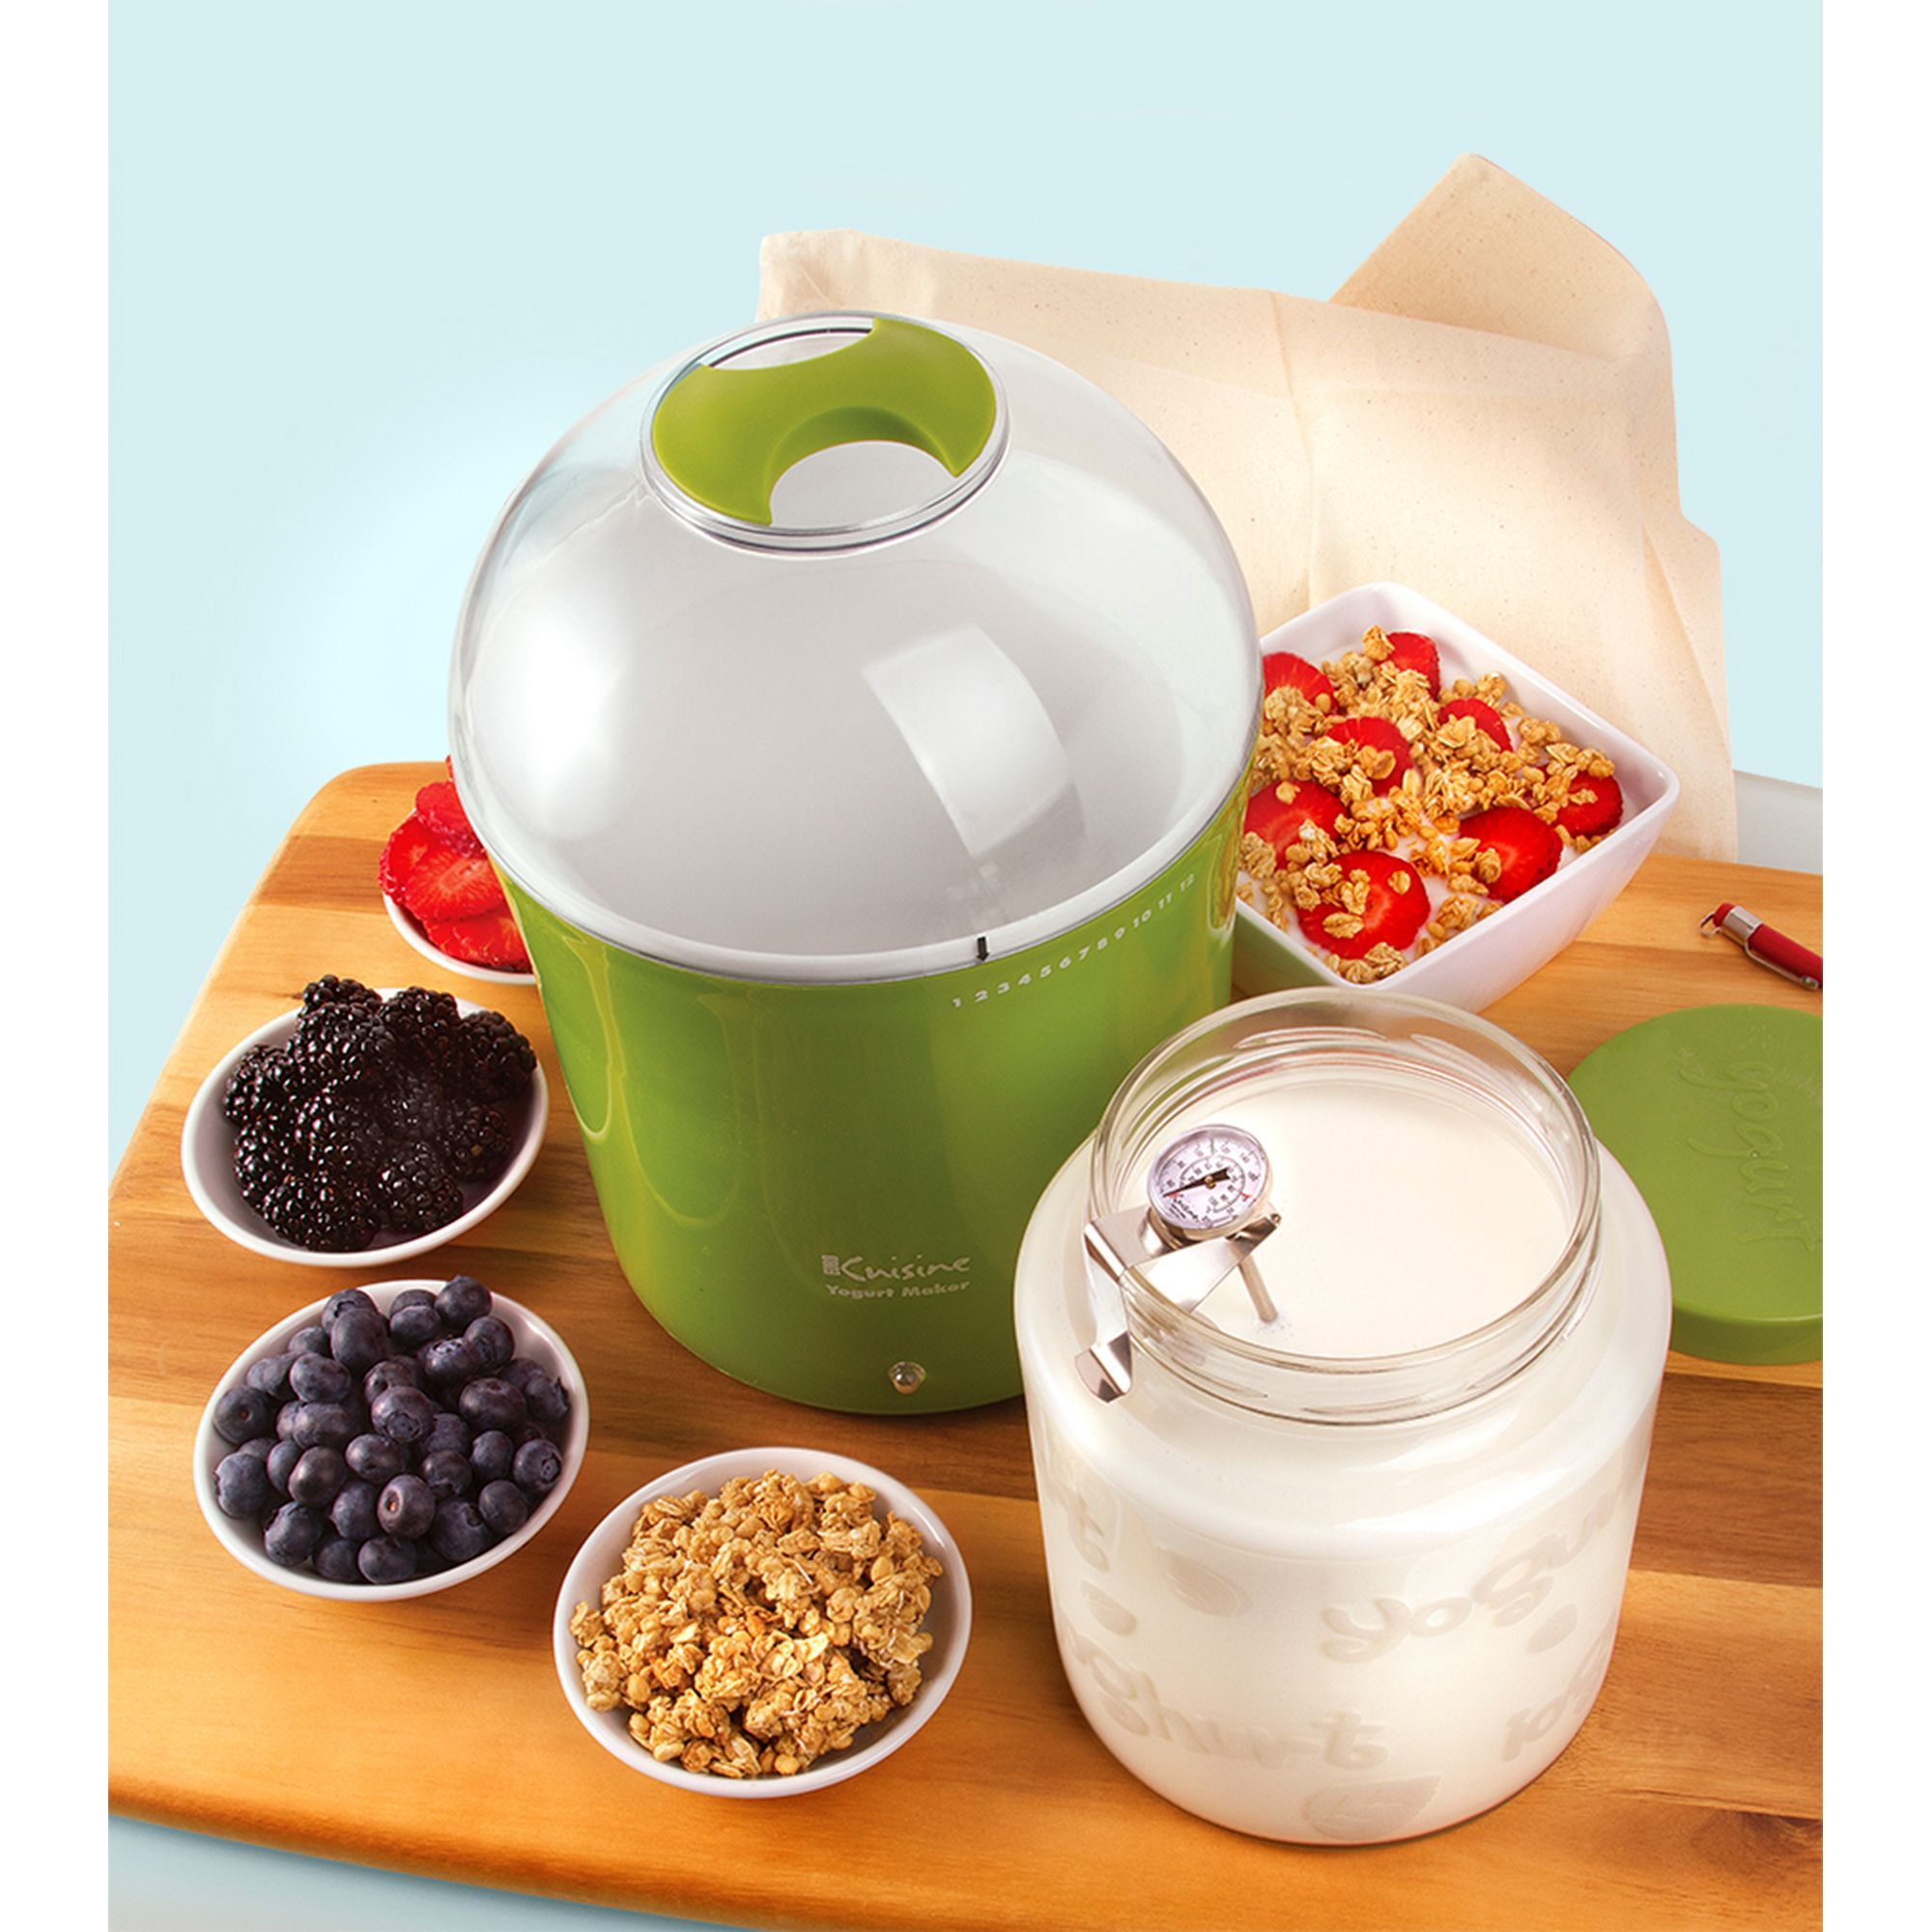 Euro Cuisine Yogurt And Greek Yogurt Maker With 2 Qt Glass Jar